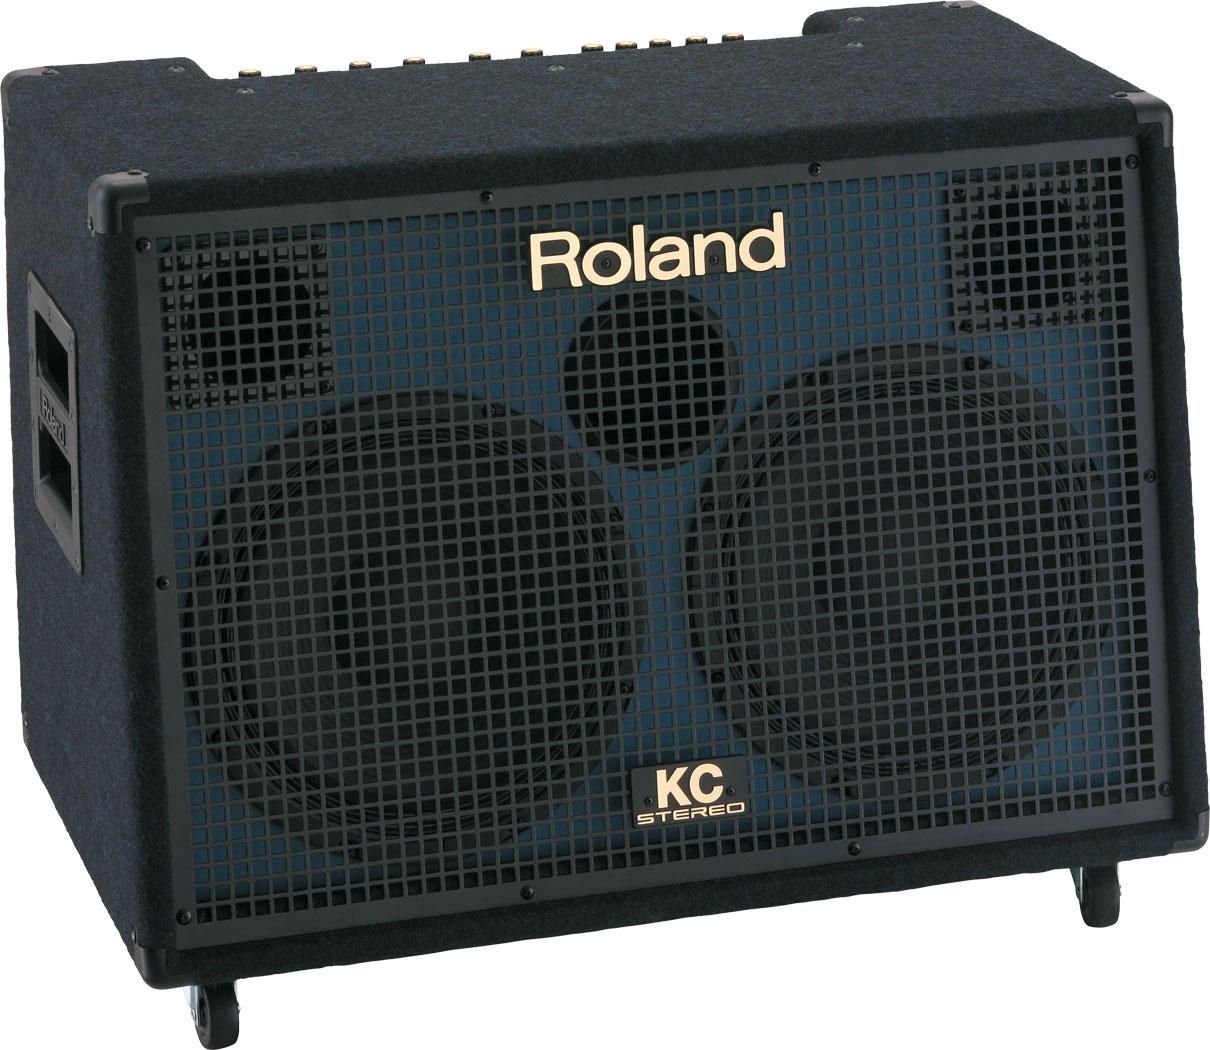 roland kc 880 stereo mixing keyboard amplifier. Black Bedroom Furniture Sets. Home Design Ideas